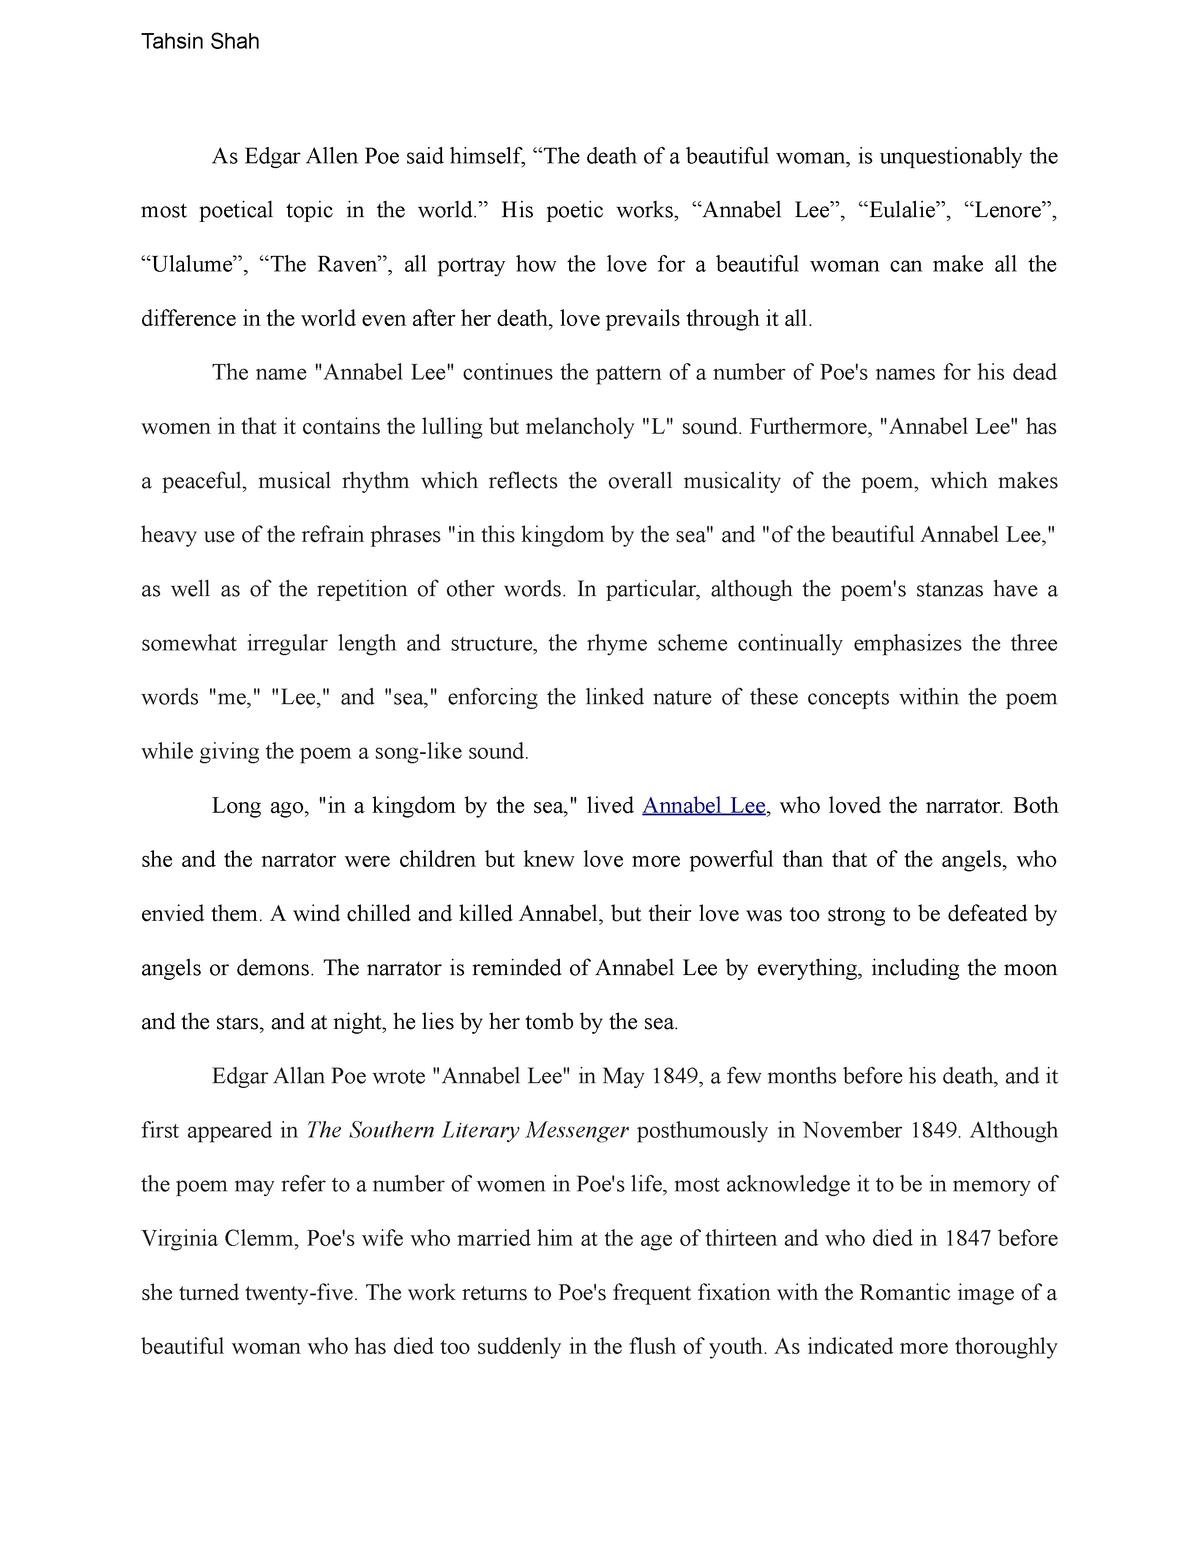 Essay 3 Grade A Engl 165w Introduction To Poetry Studocu